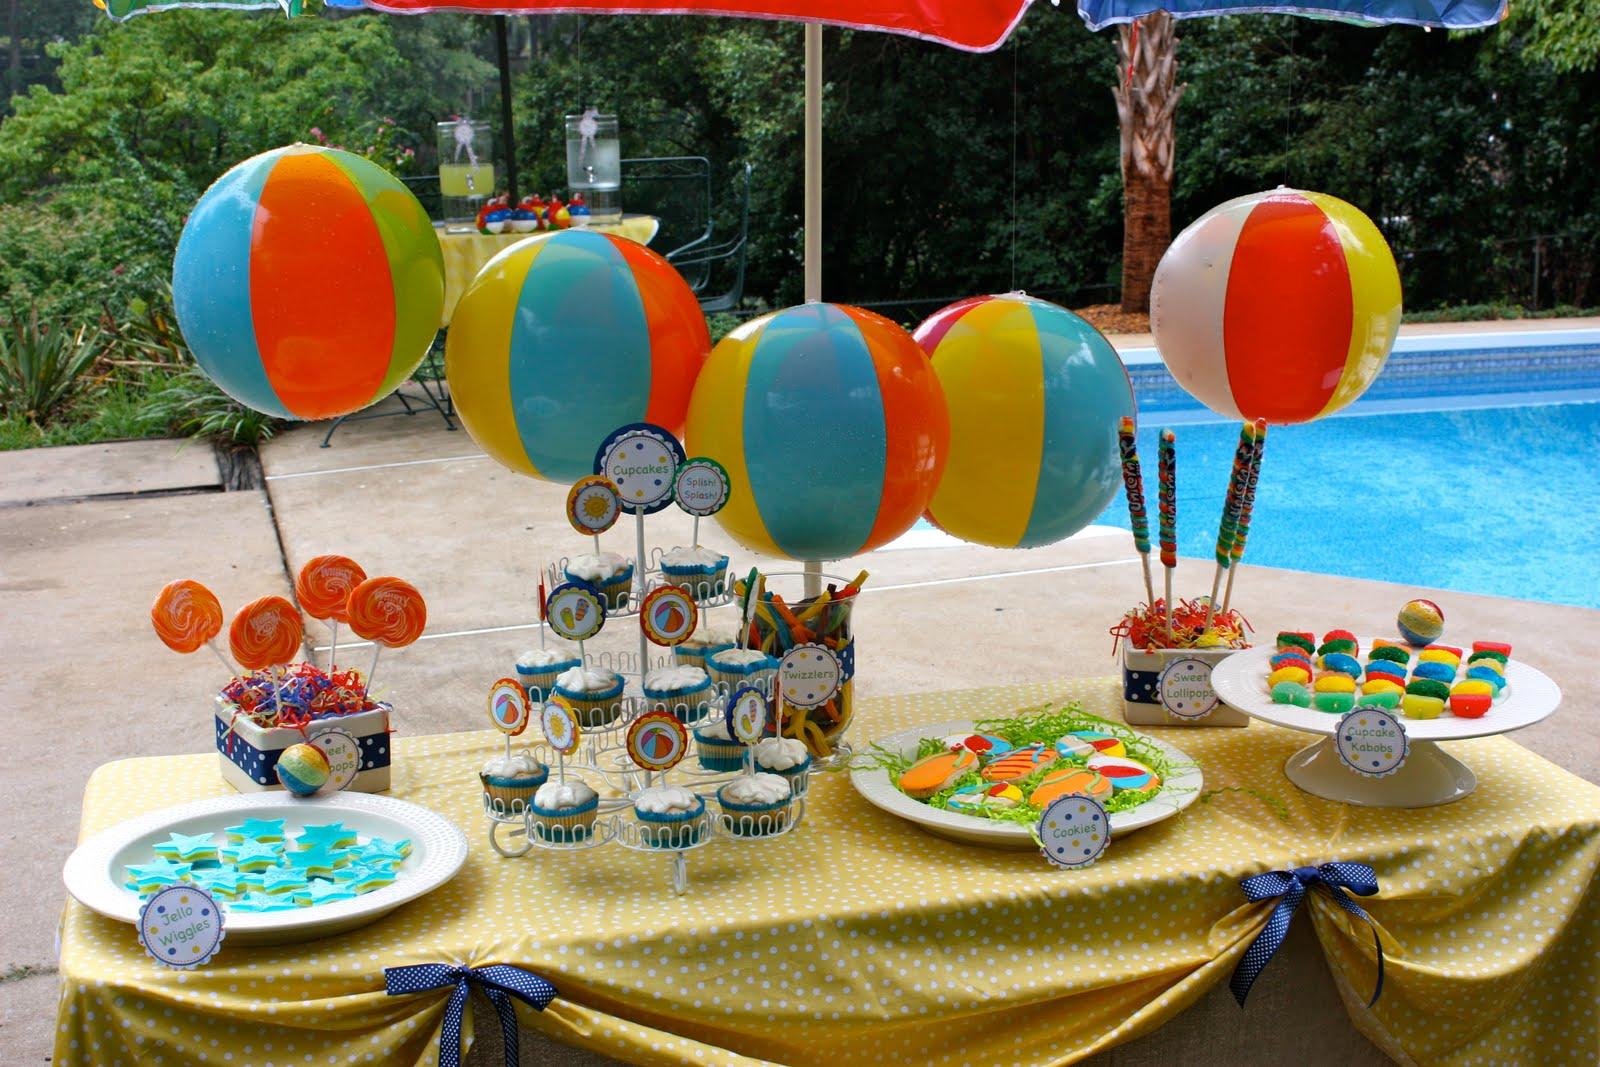 Pluff mudd studio splish splash for Pool and food